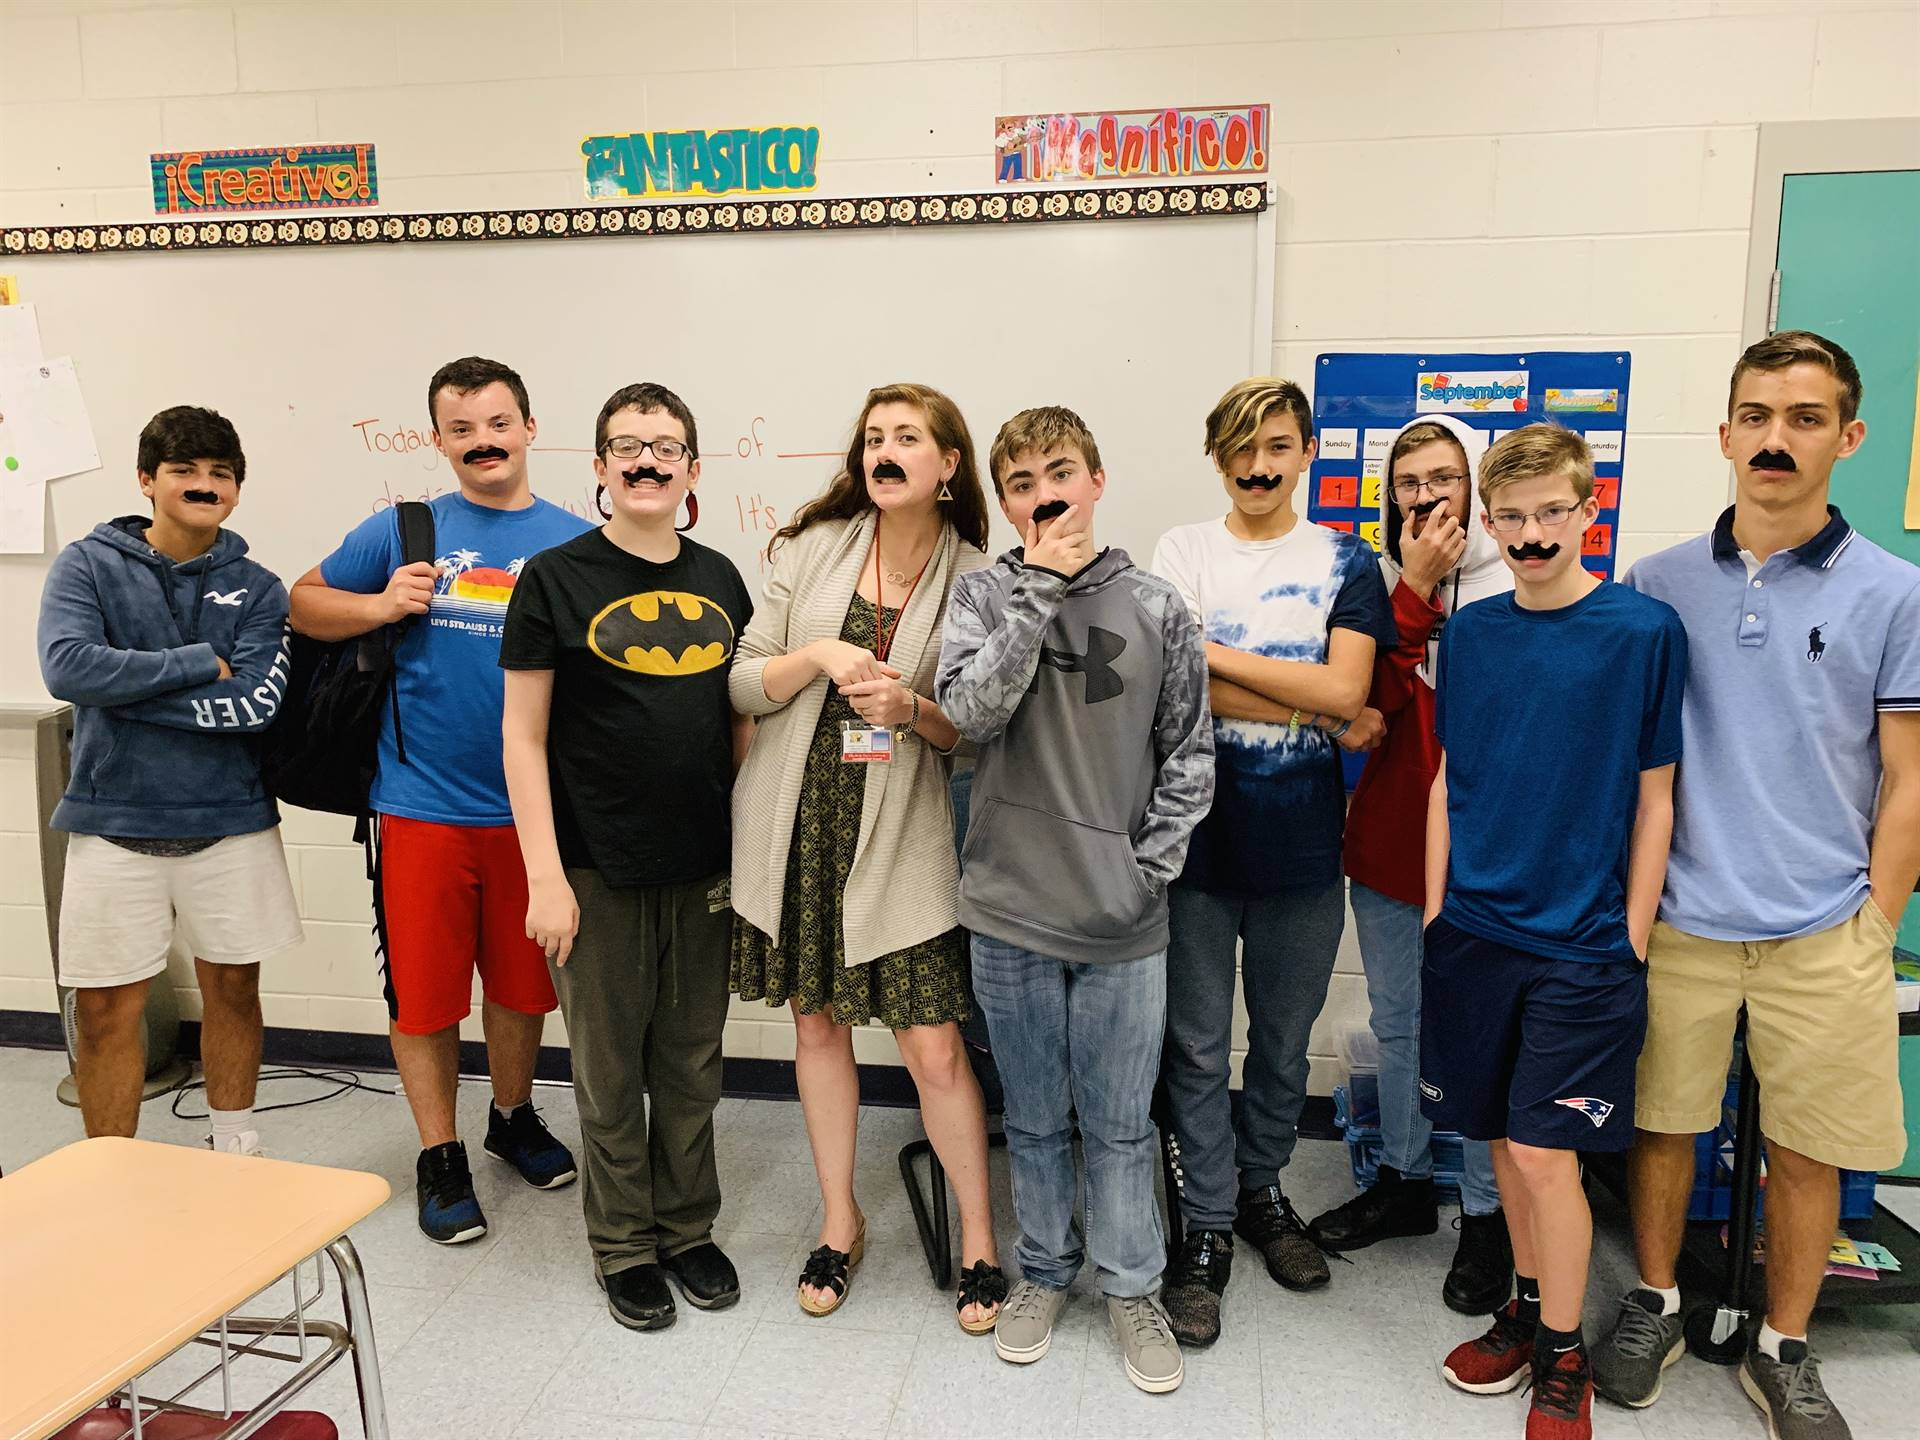 Spanish class wearing los mostachos